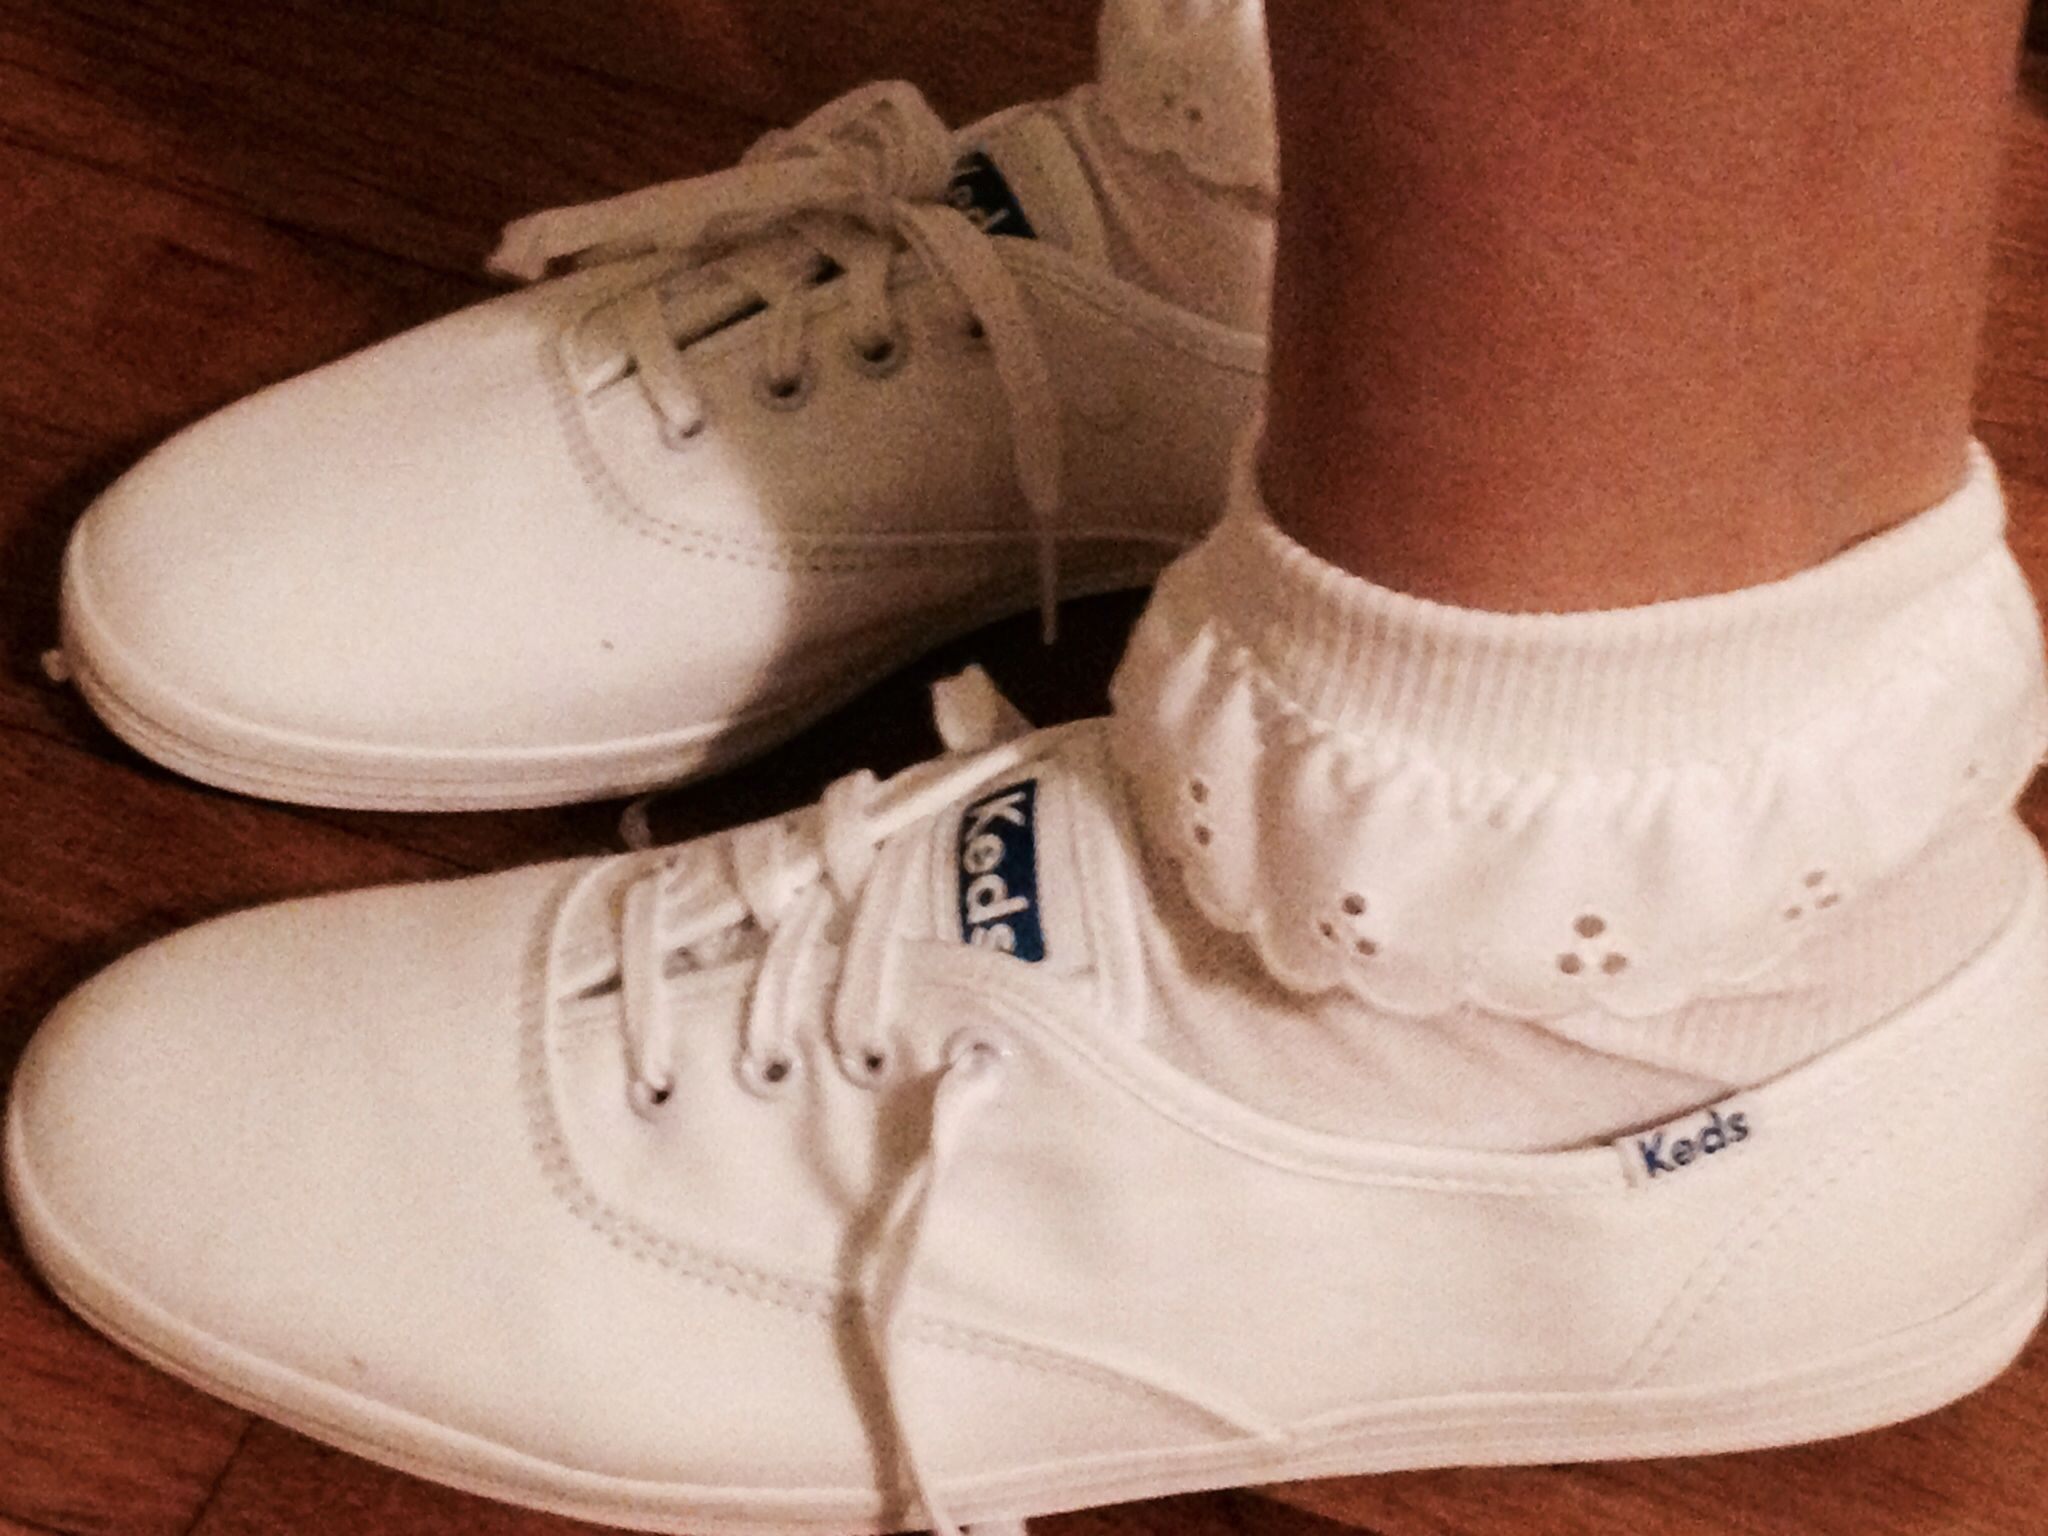 919c94f91405 Keds and lace socks